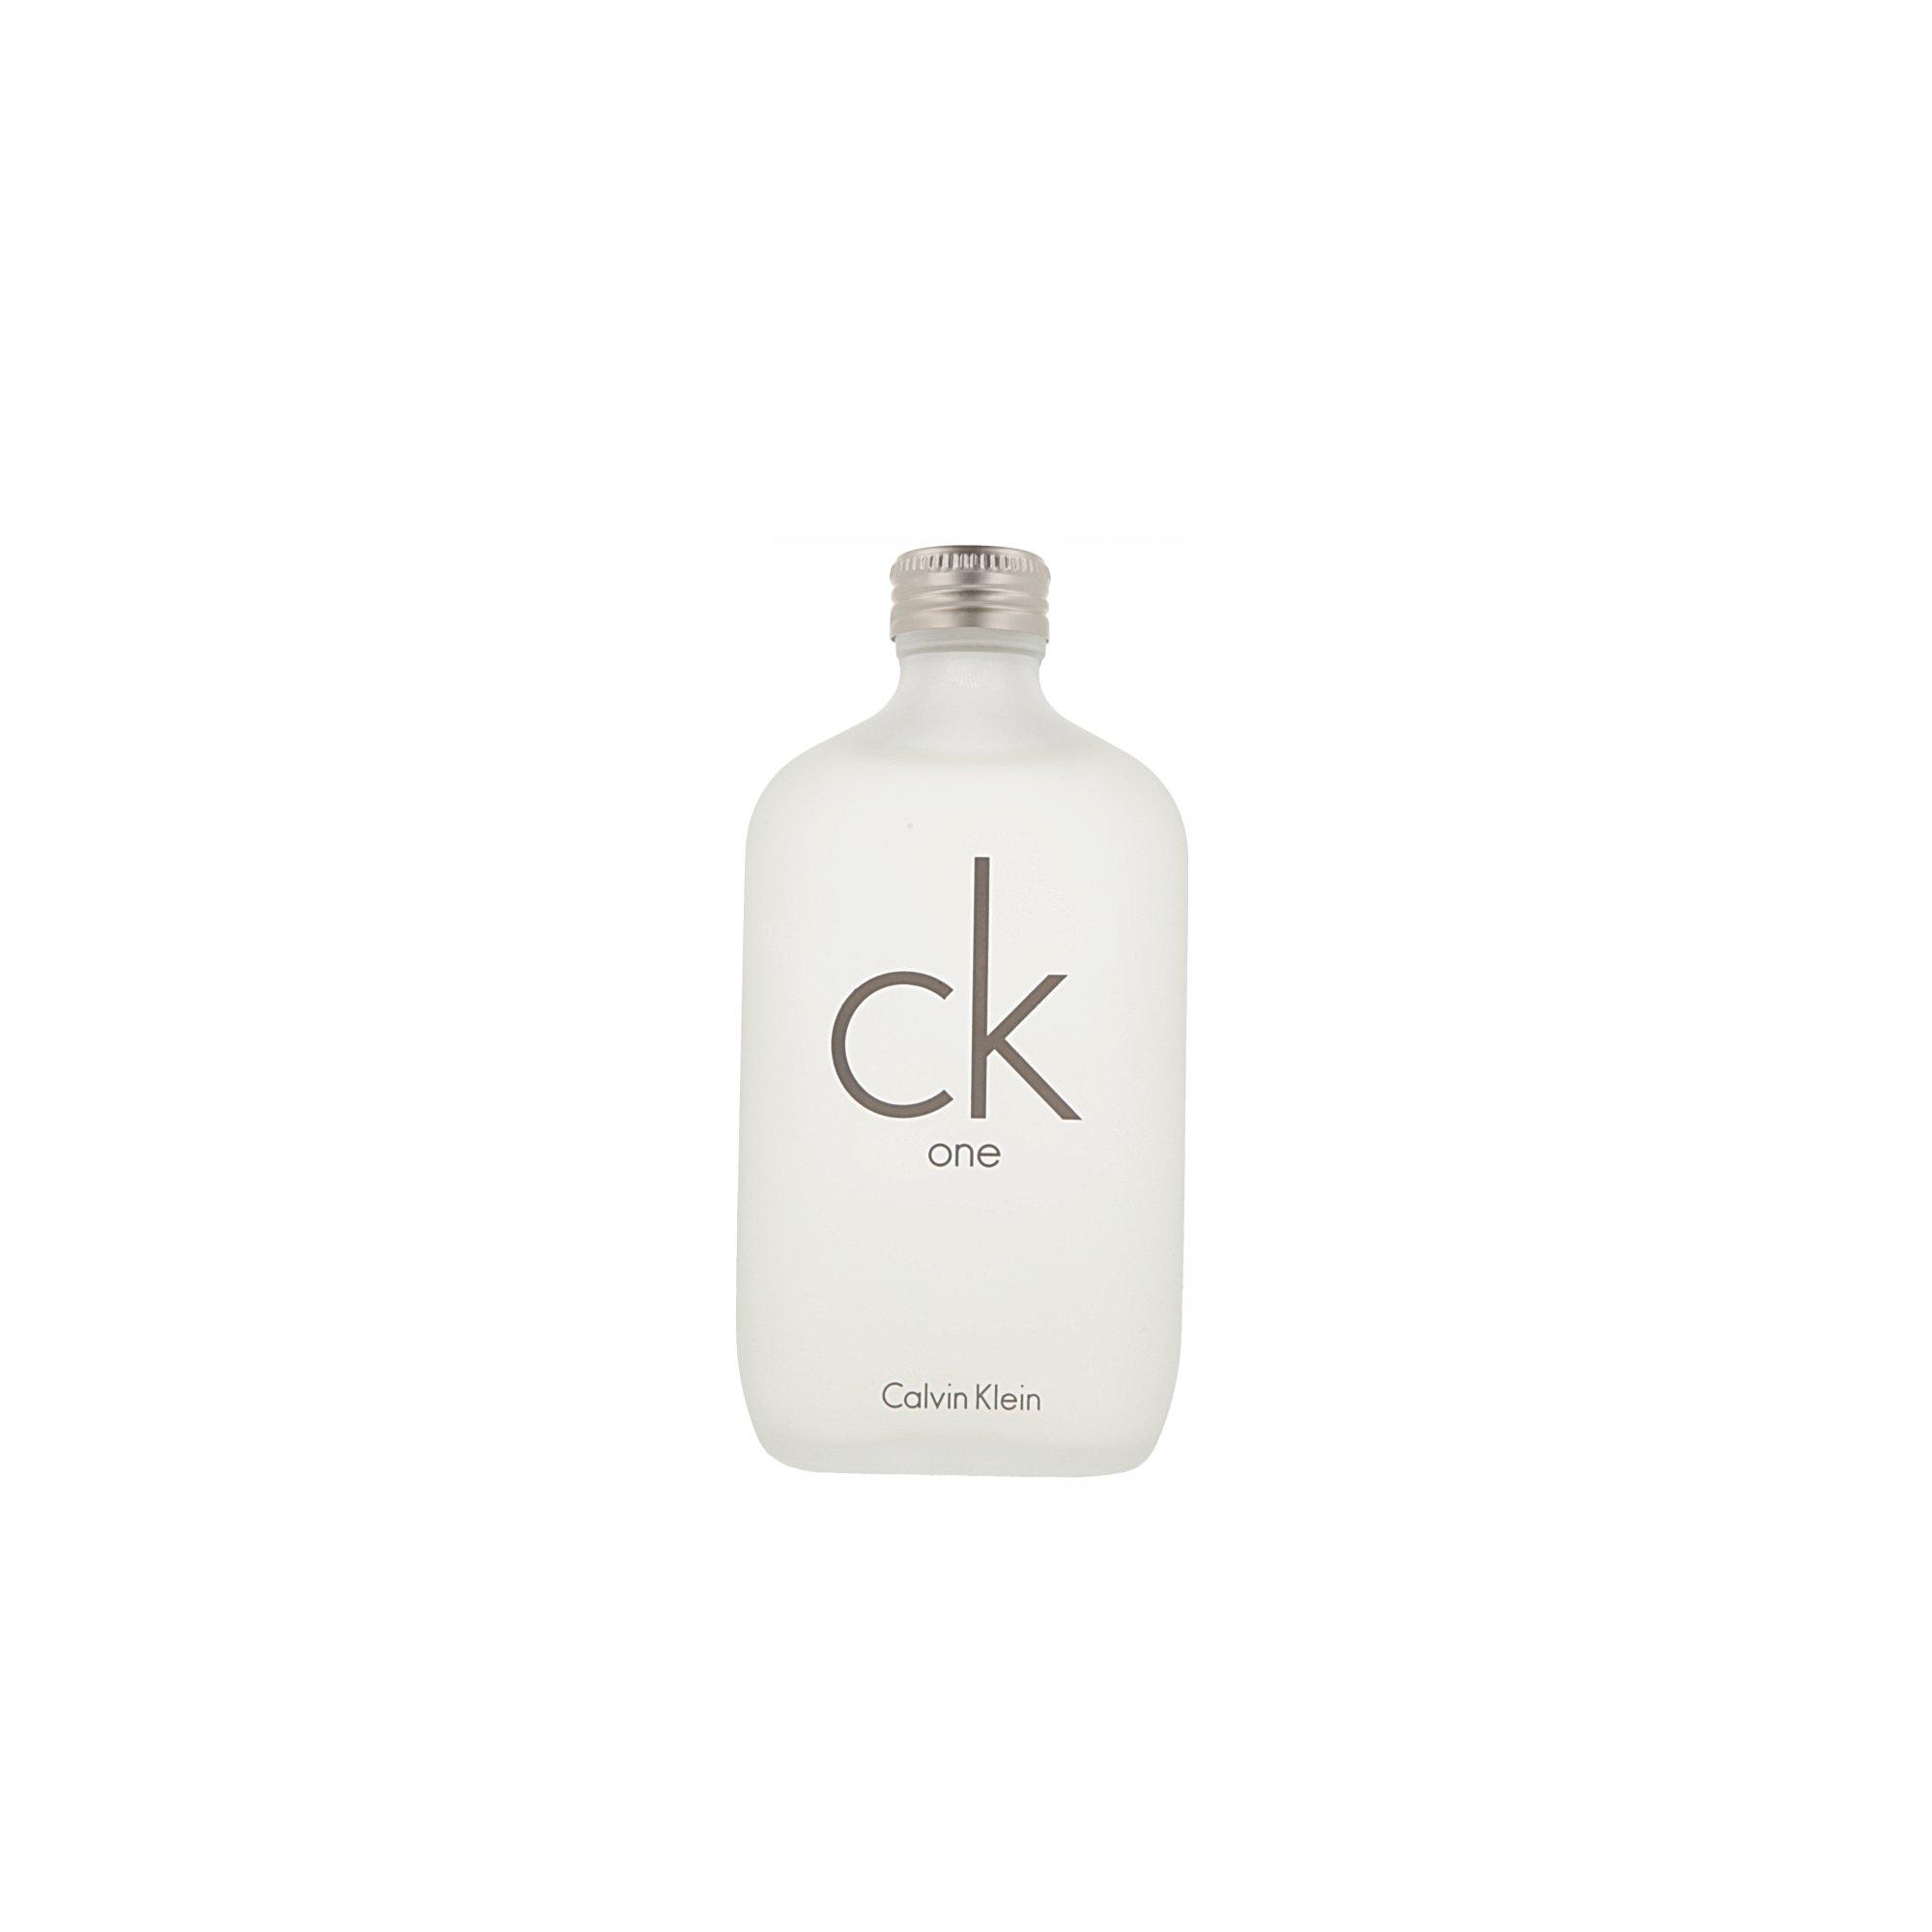 bc1c073b3 Calvin Klein CK One woda toaletowa spray 200ml - 7339837975 ...